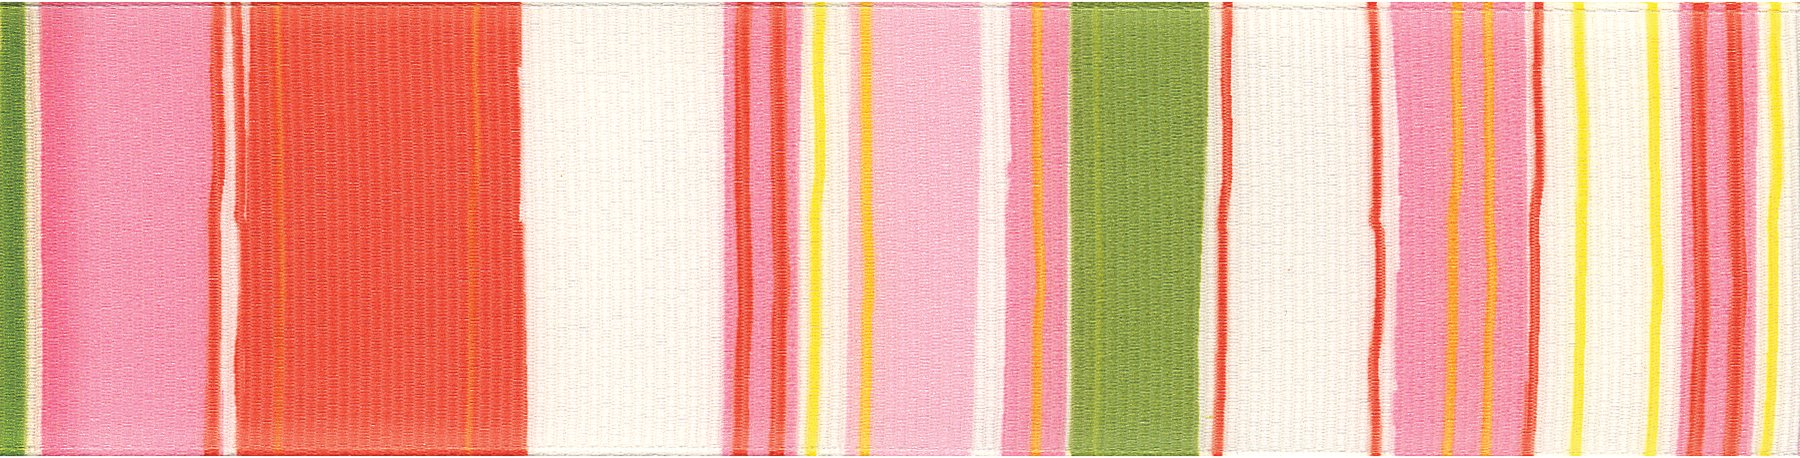 Offray Retro Stripe Craft Ribbon, 1 1/2-Inch x 9-Feet, Pink & Green